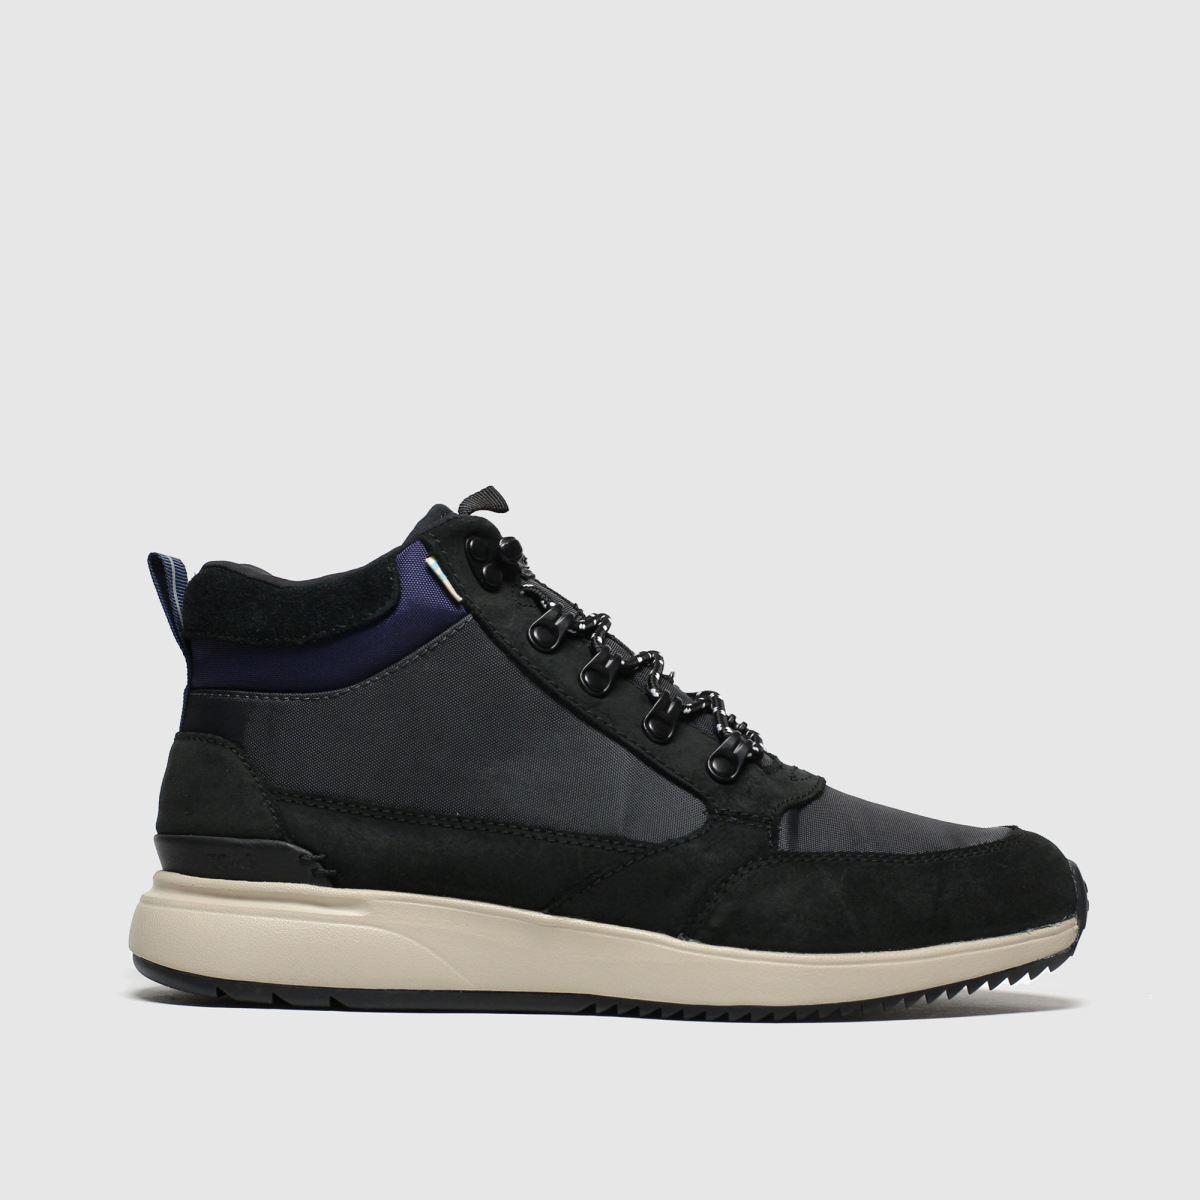 Toms Black Skully Boots